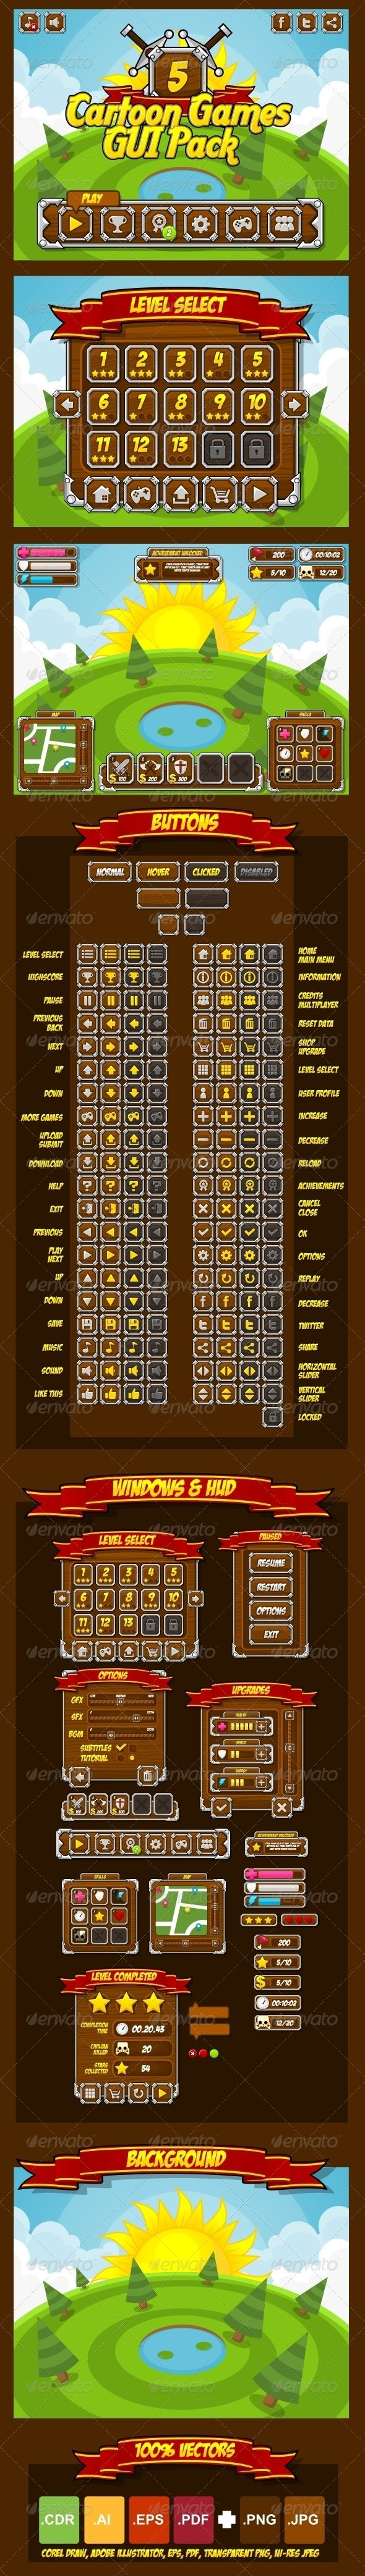 Cartoon-Games-GUI-Pack-5